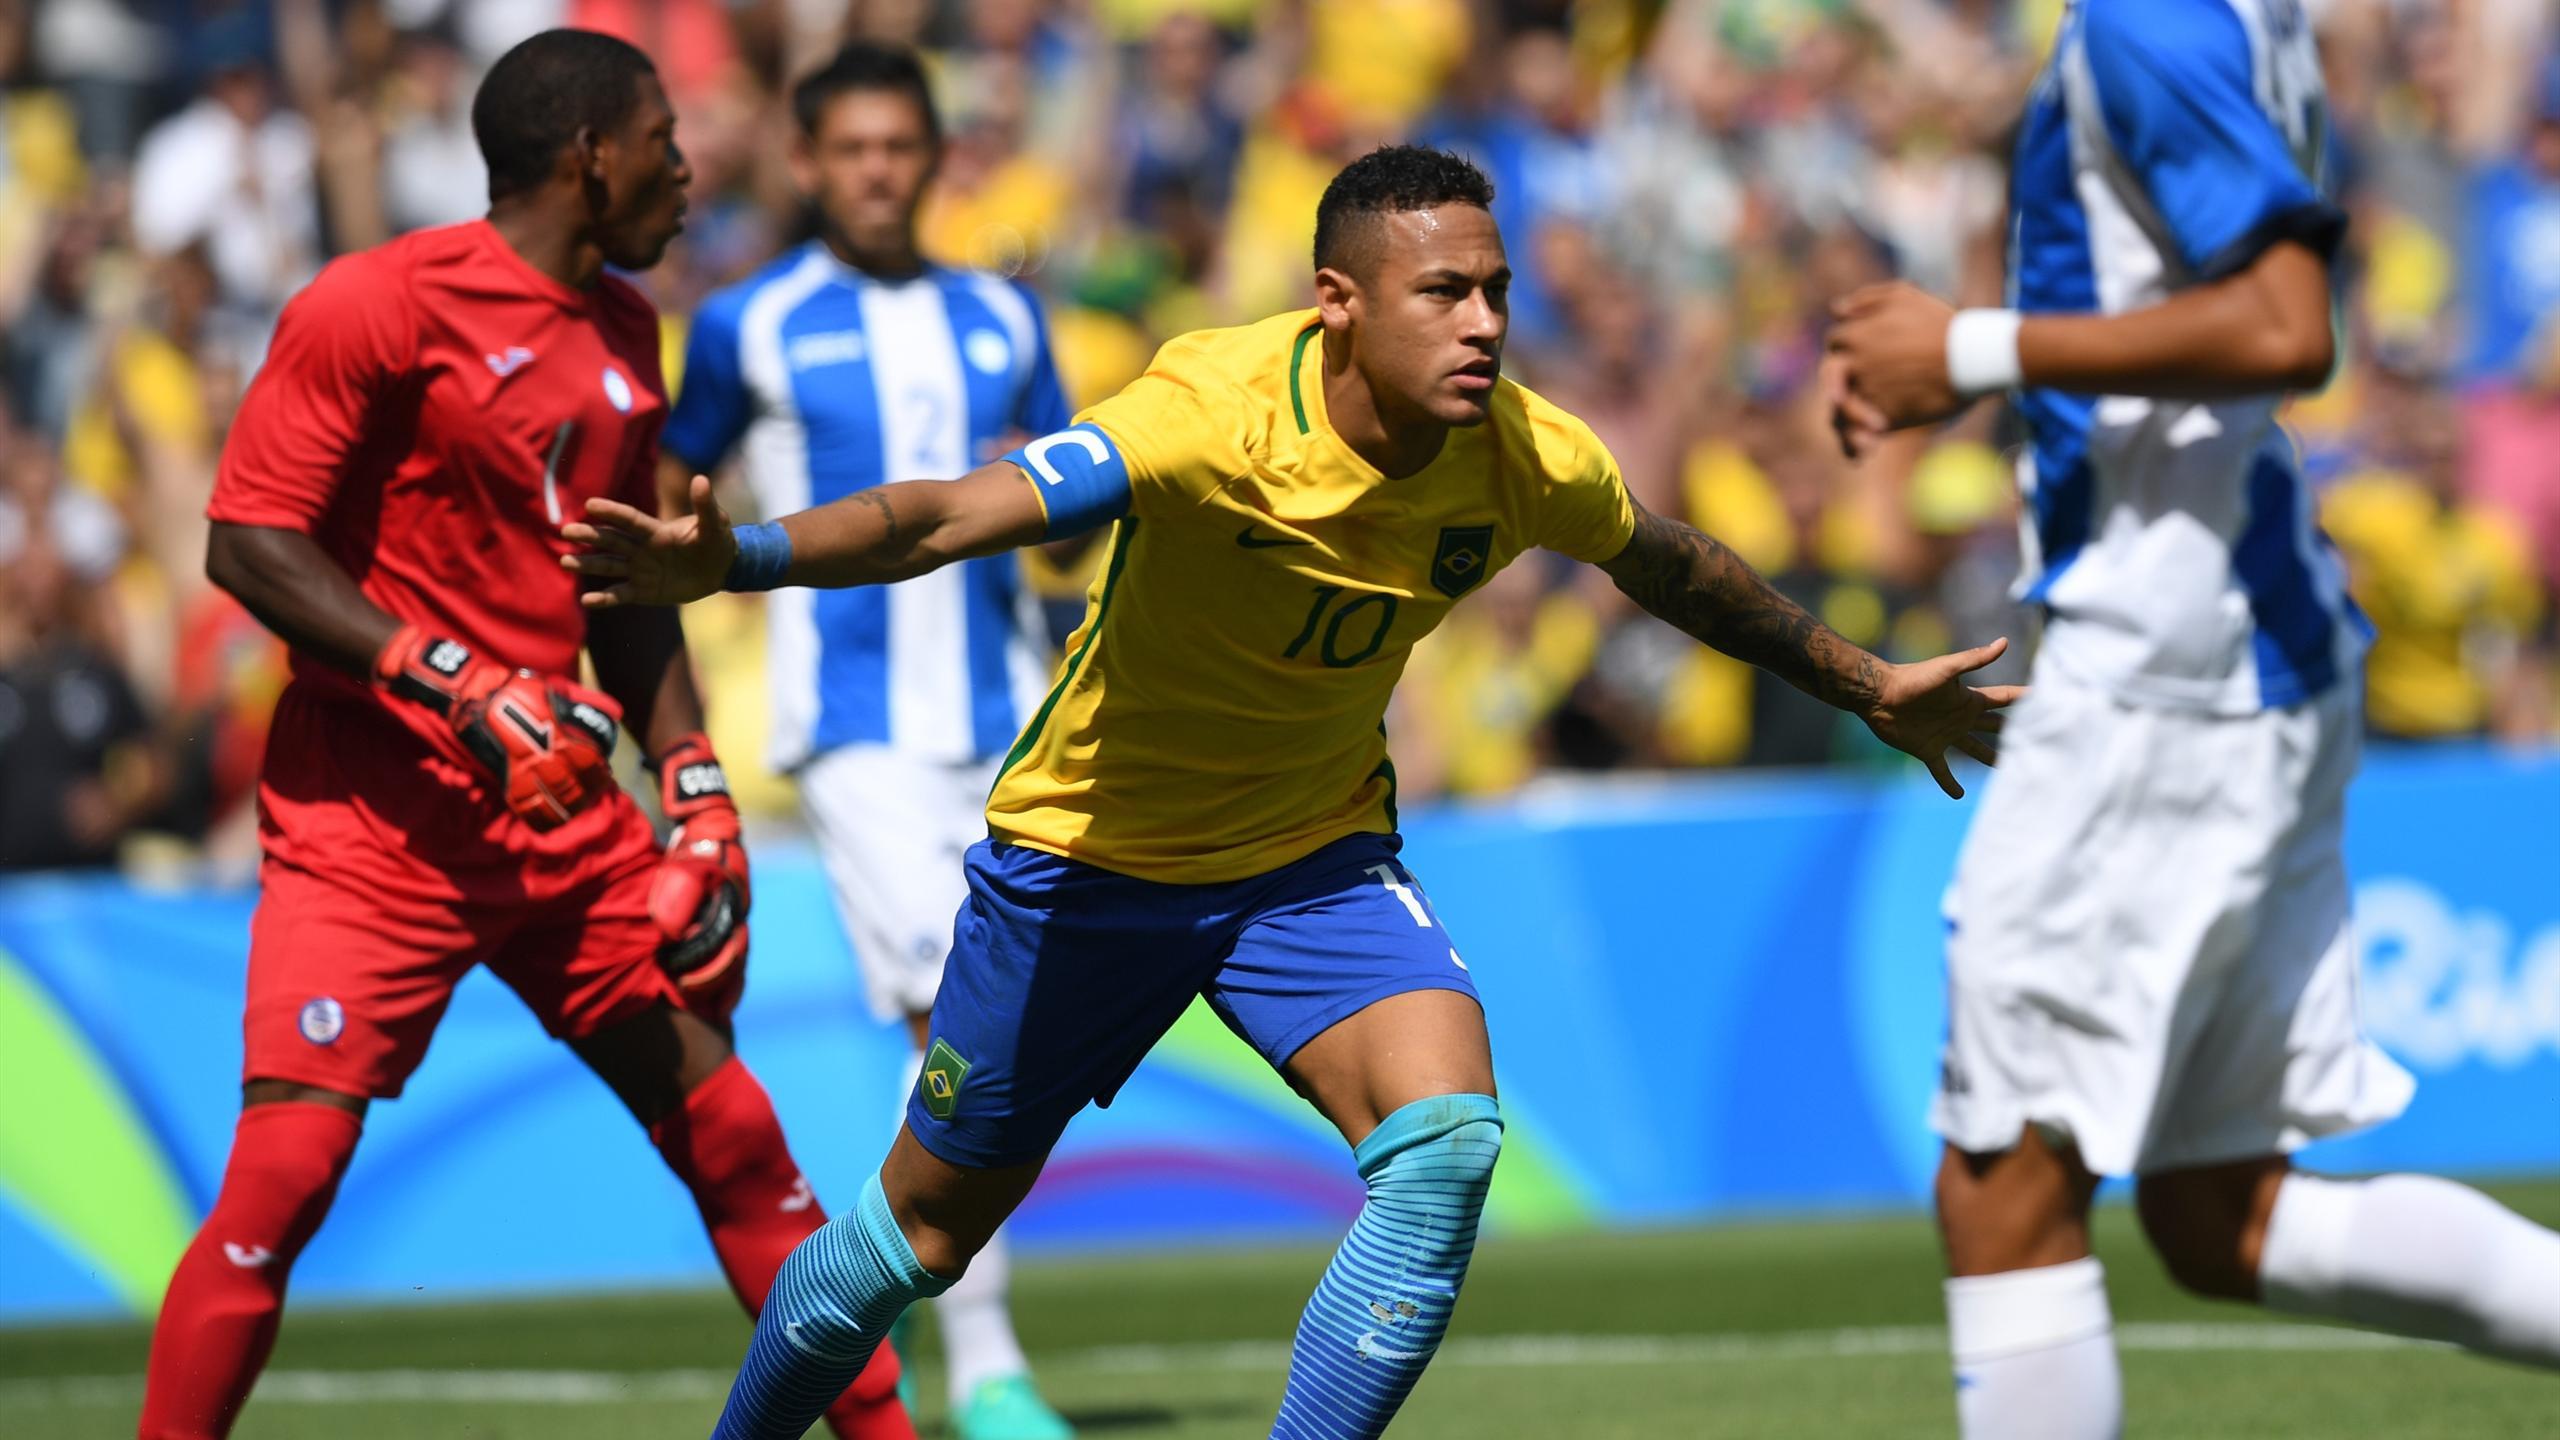 Brazil's Neymar (C) celebrates after scoring against Honduras during their Rio 2016 Olympic Games Men's semi-final football match at the Maracana Stadium